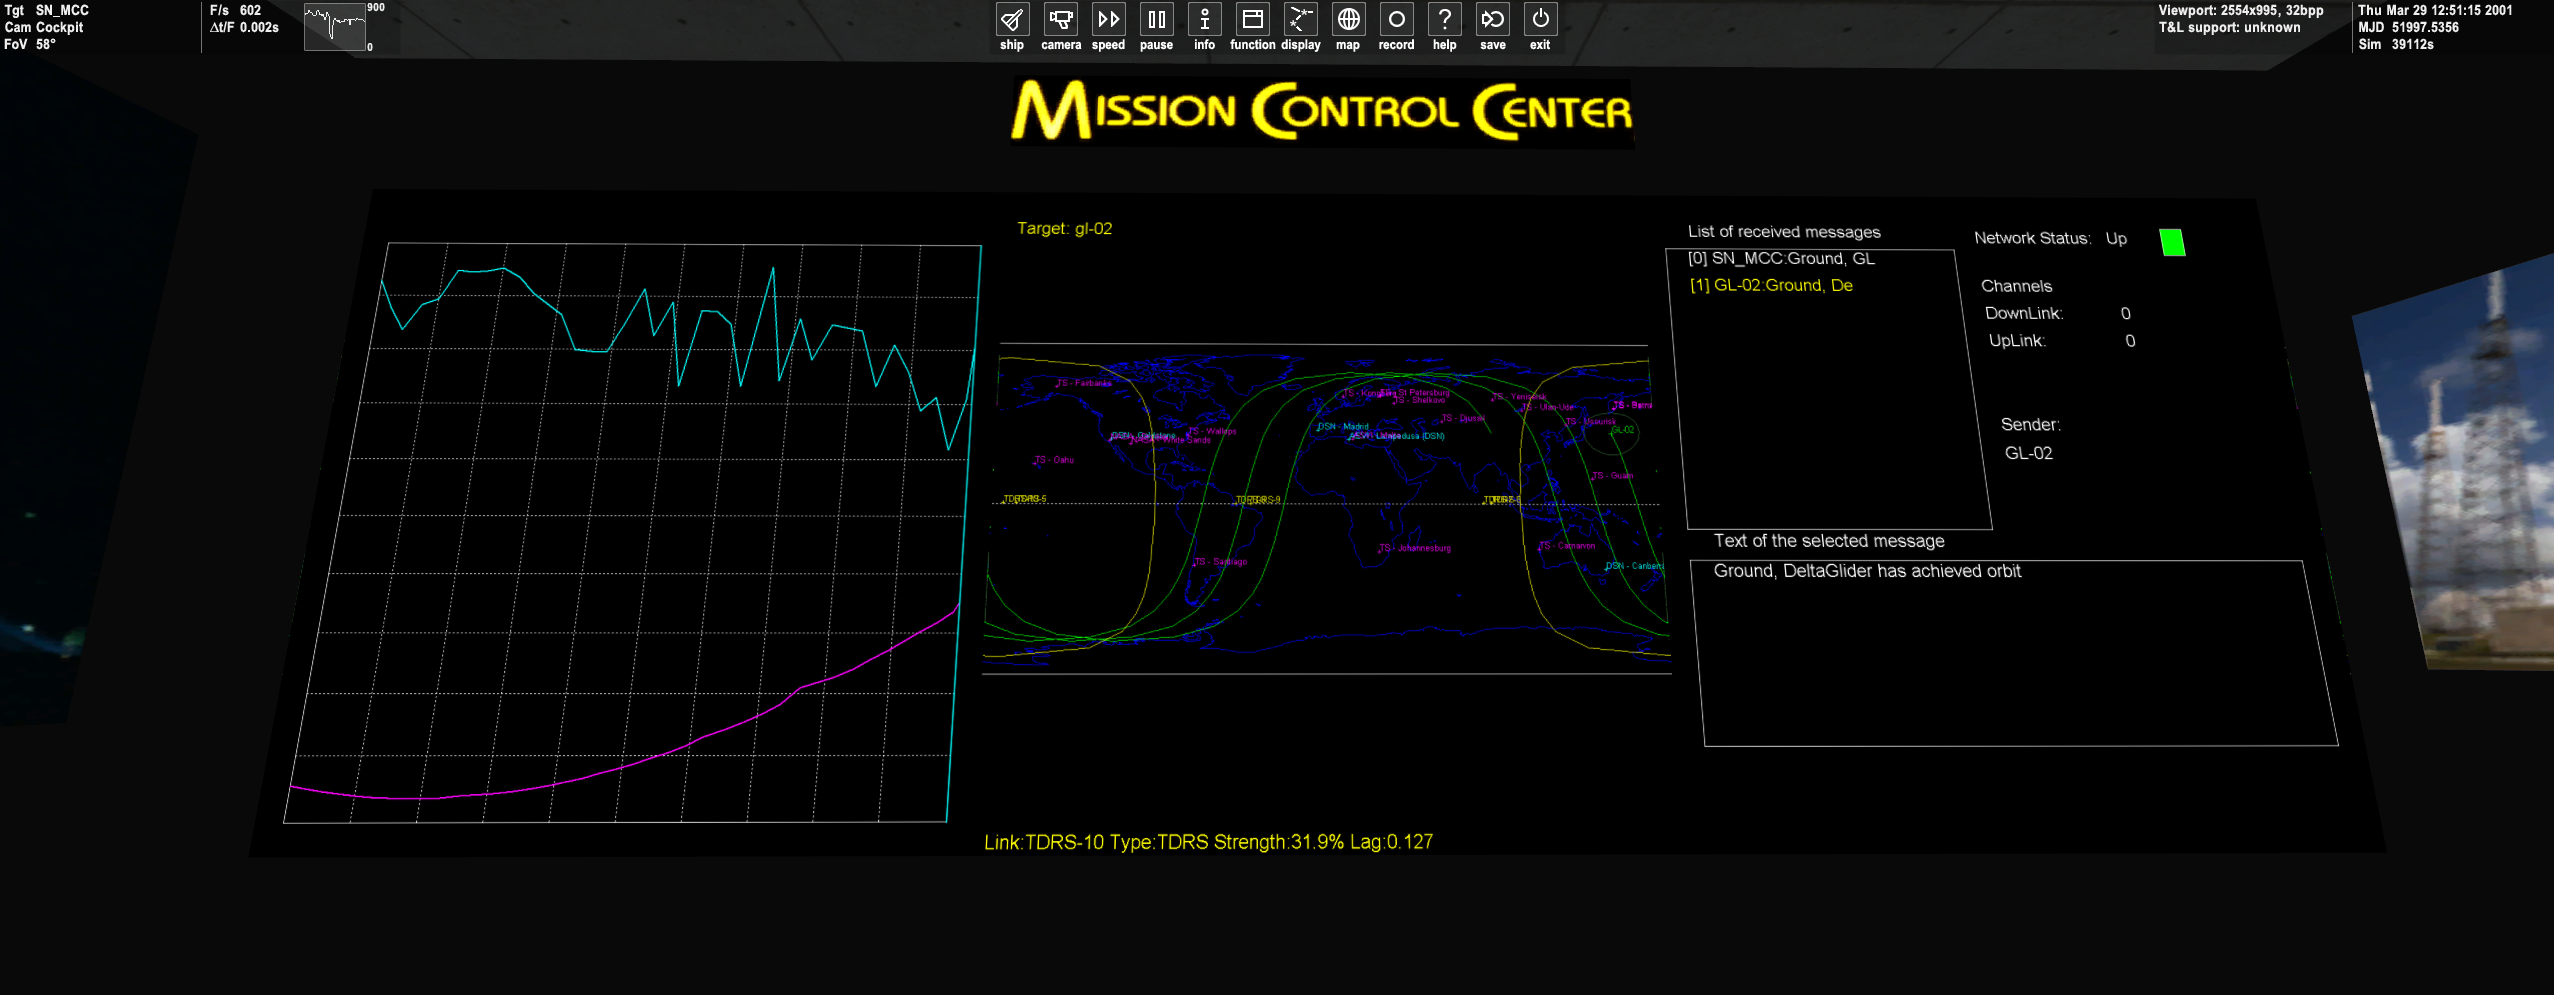 OHM Space Network Plugin - Page 7 - Orbiter-Forum